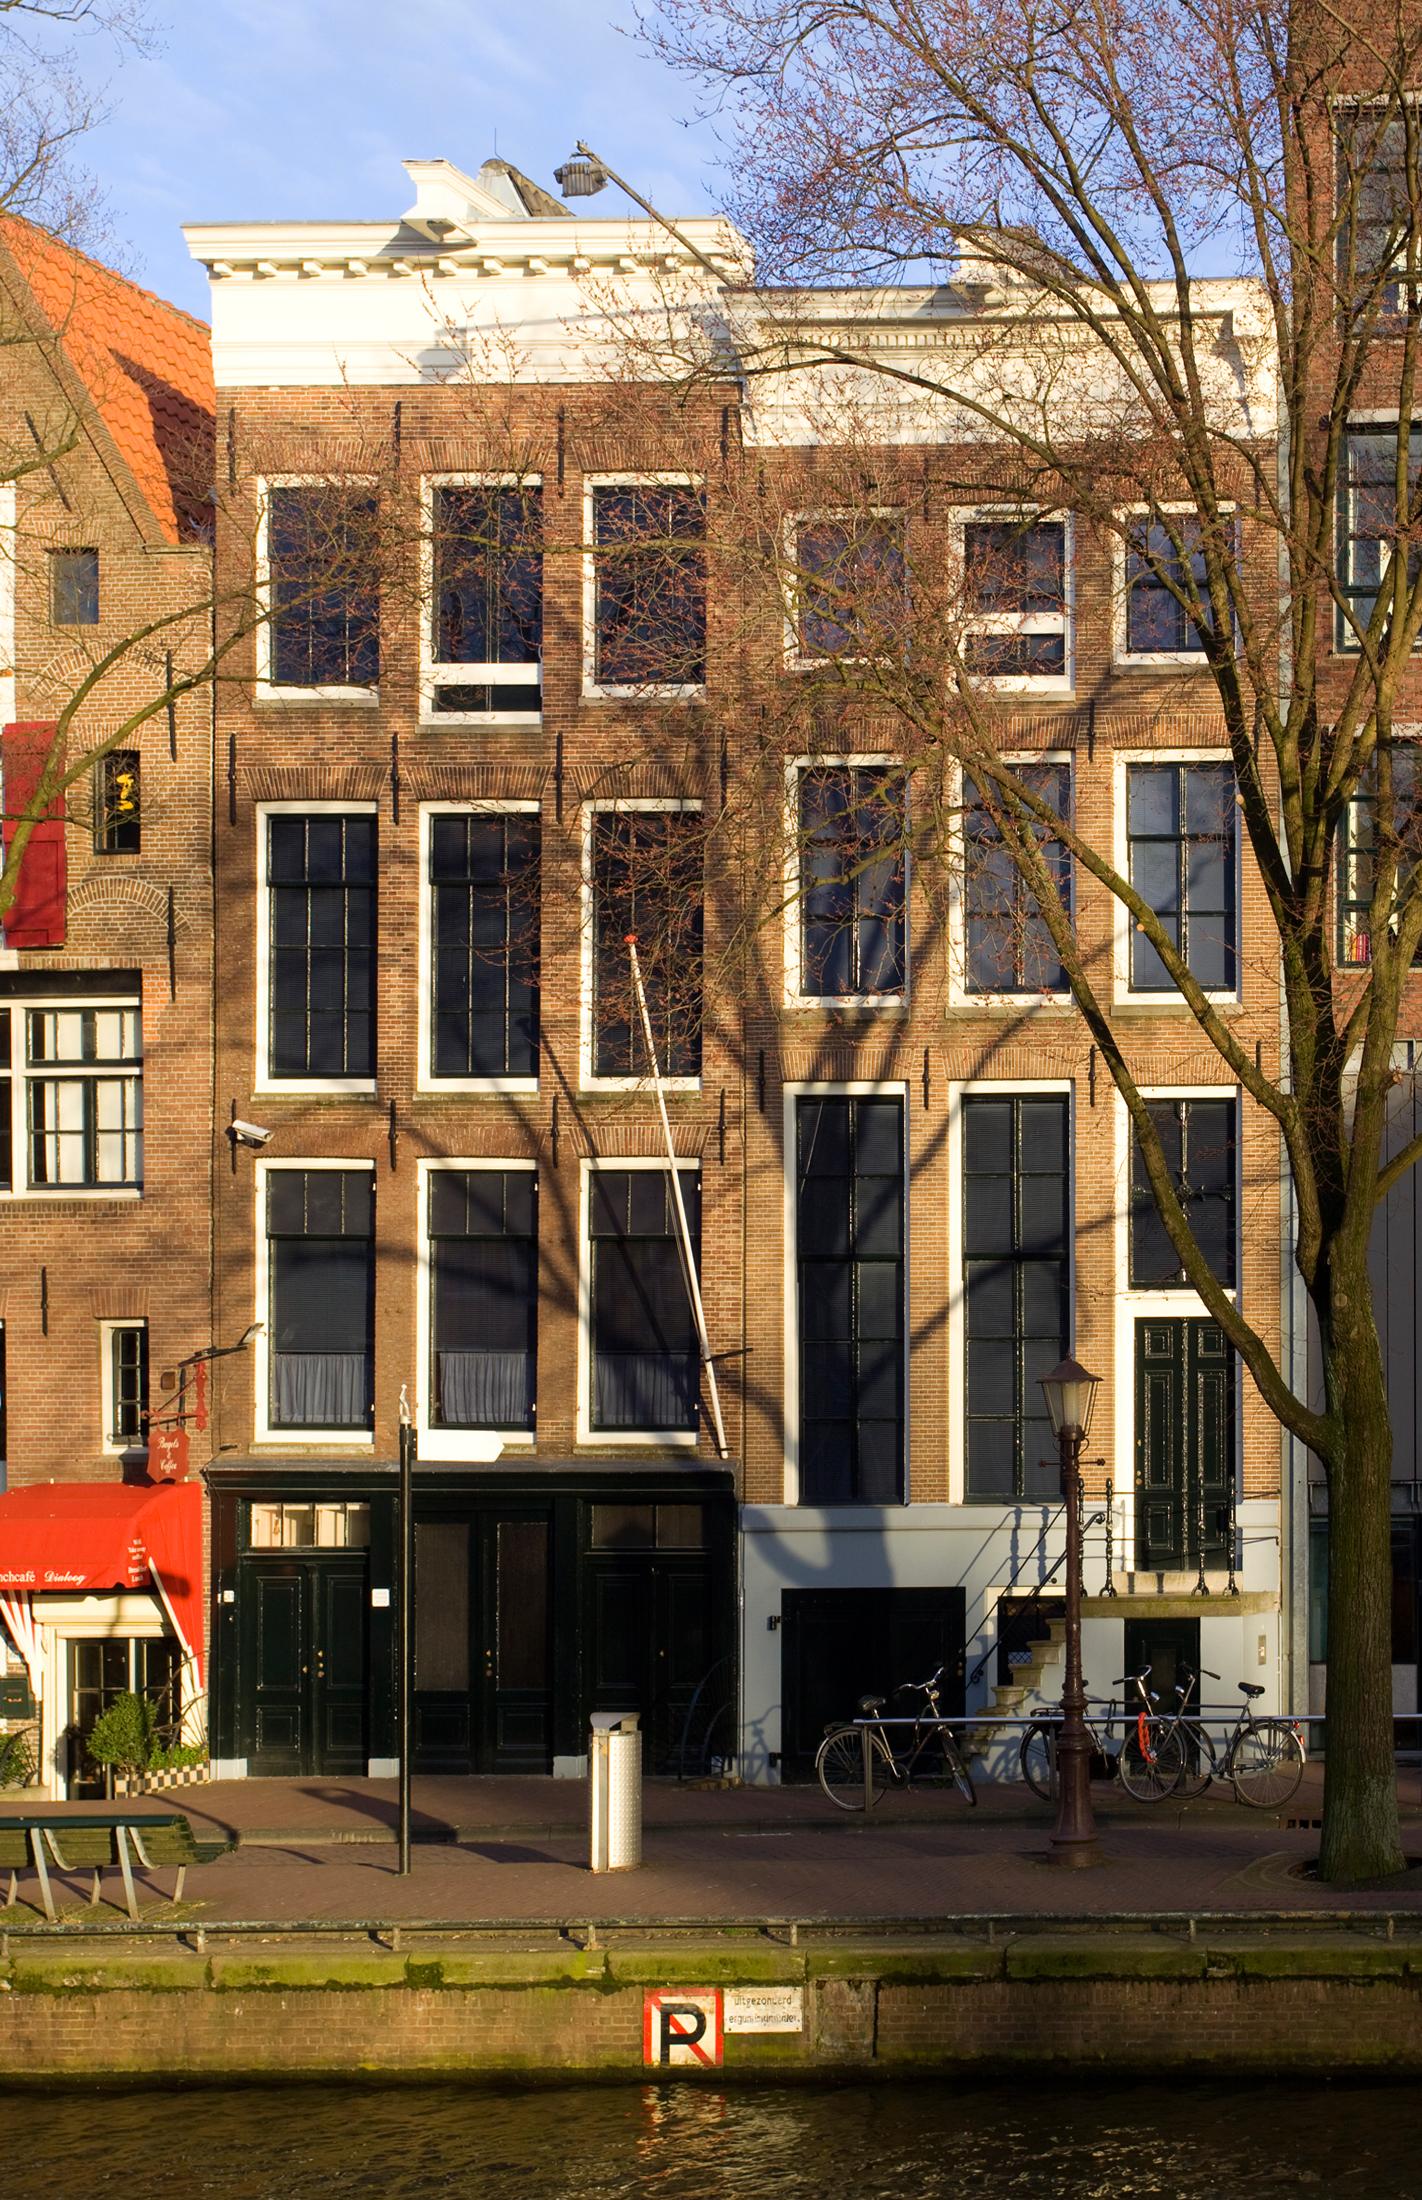 Anne Frank Haus –